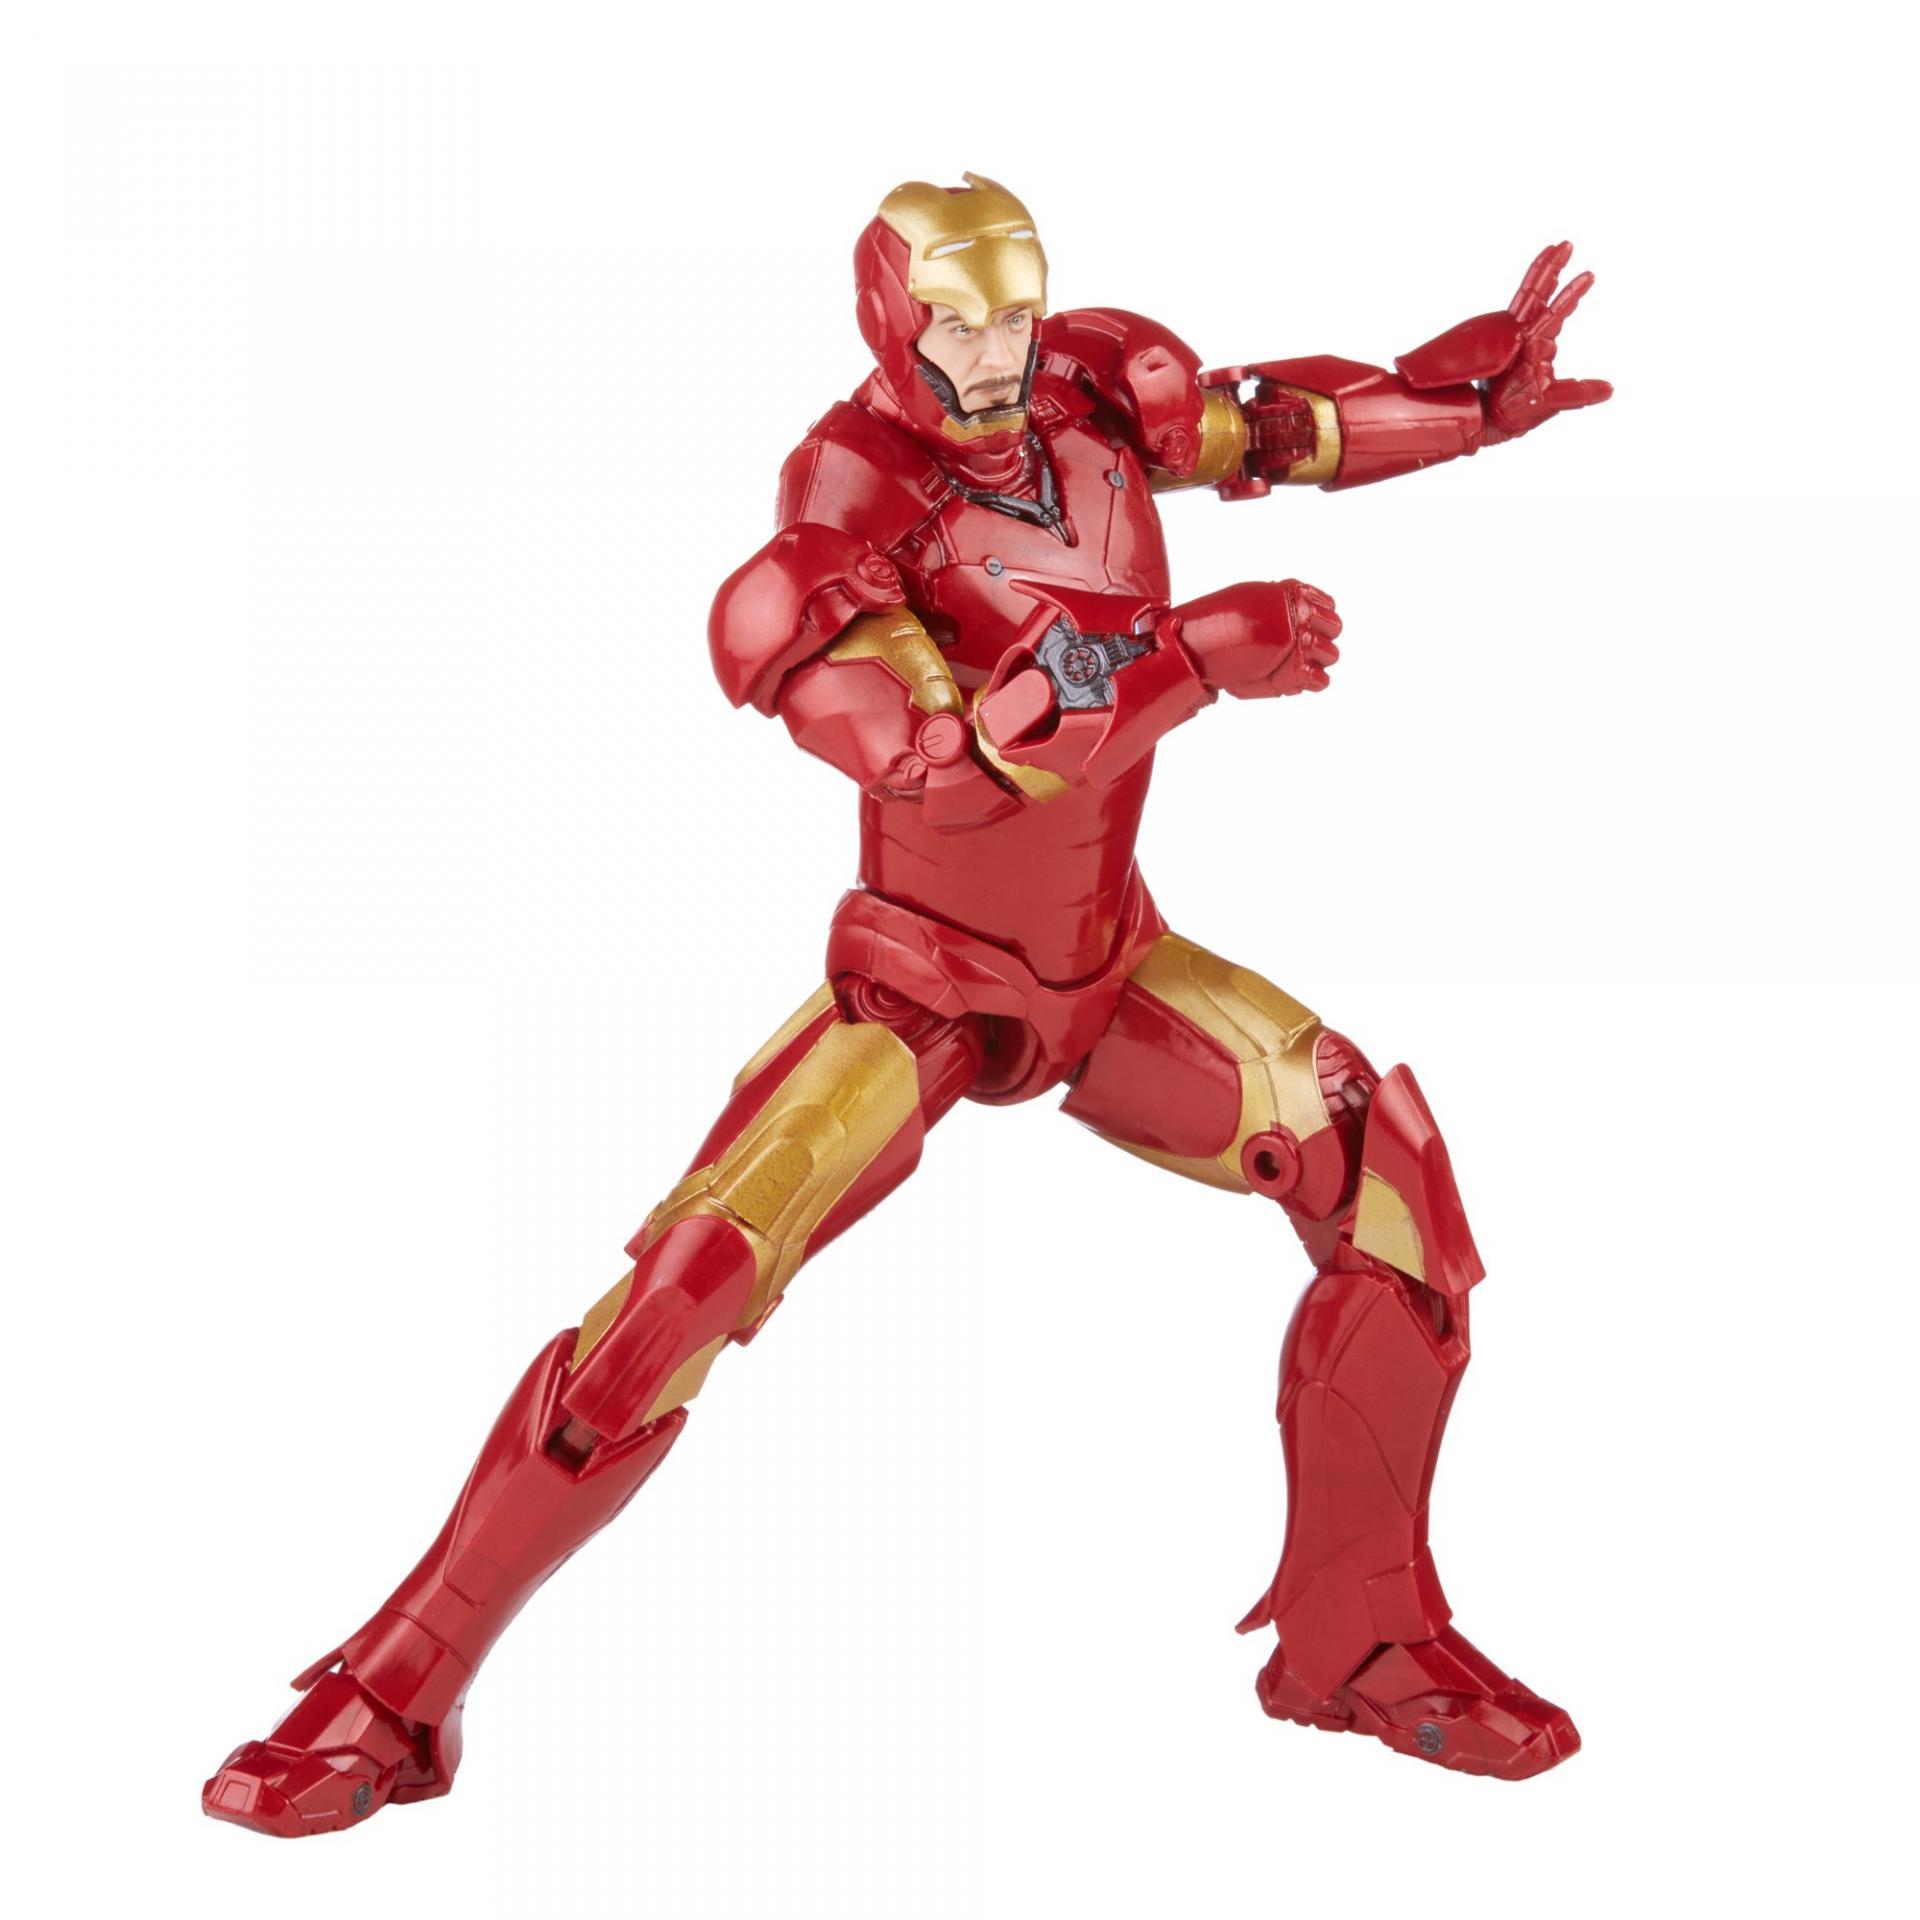 Marvel legends series hasbro iron man mark 311